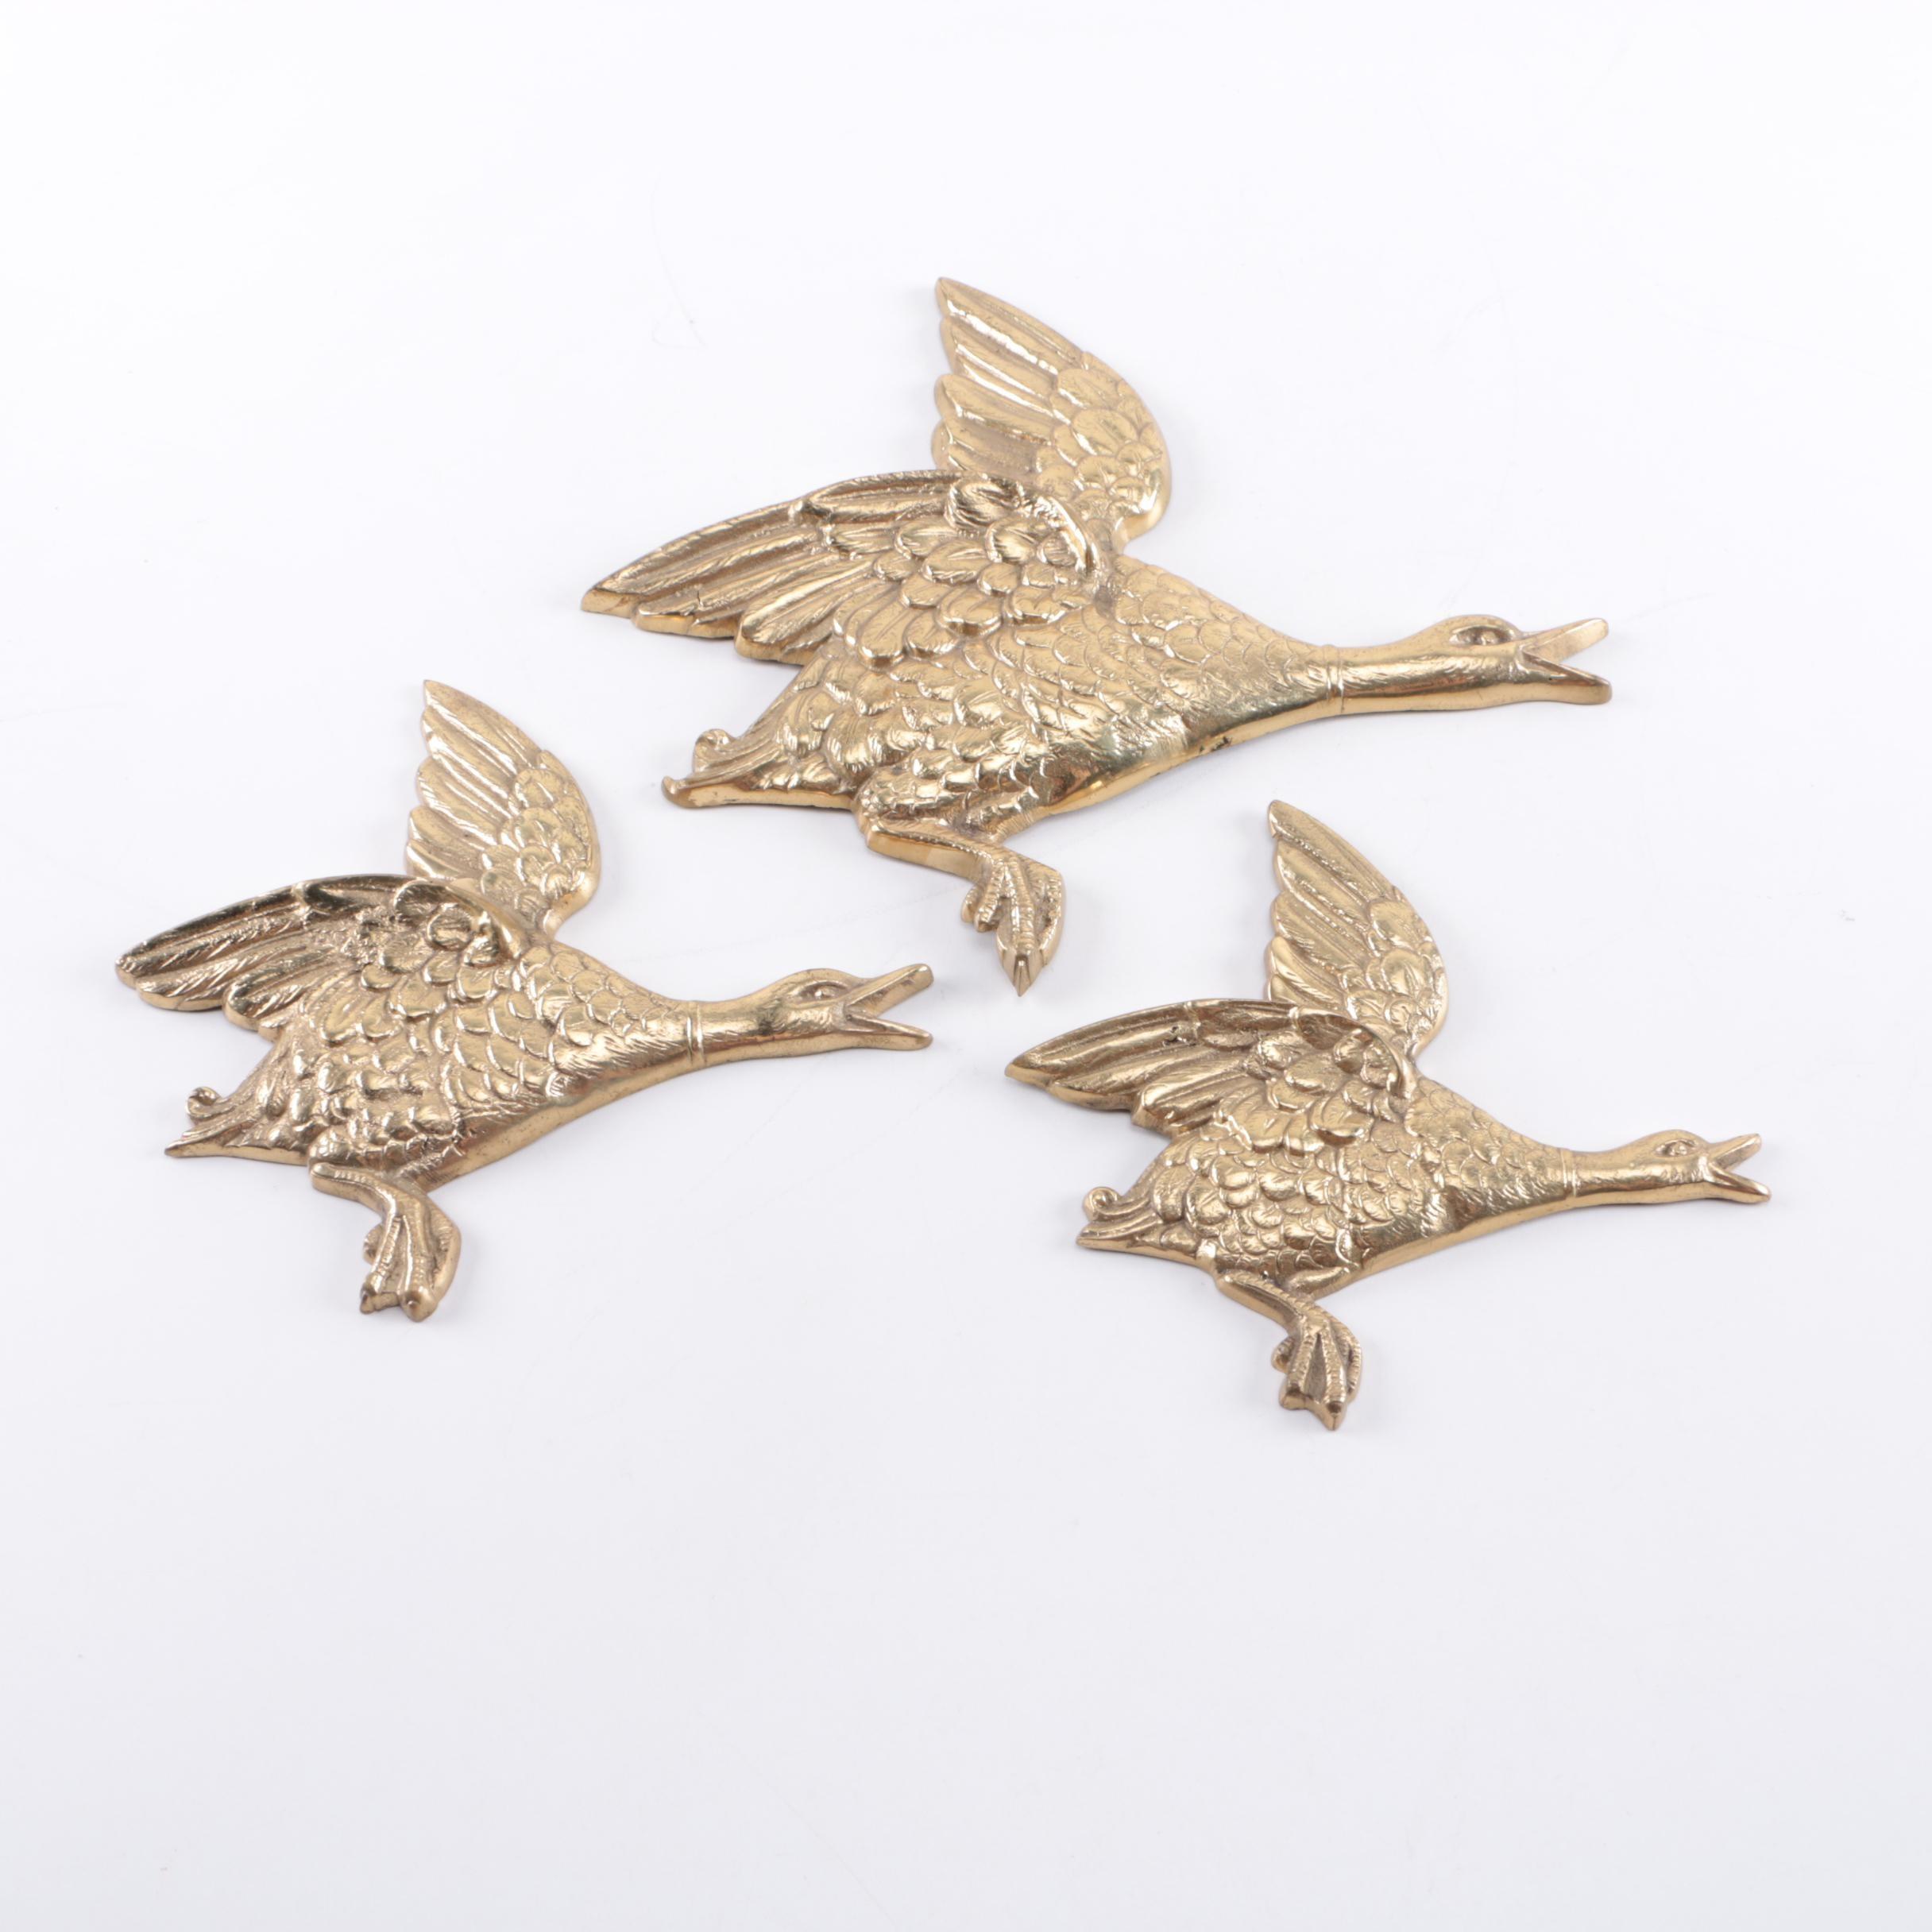 Three Vintage Brass Geese